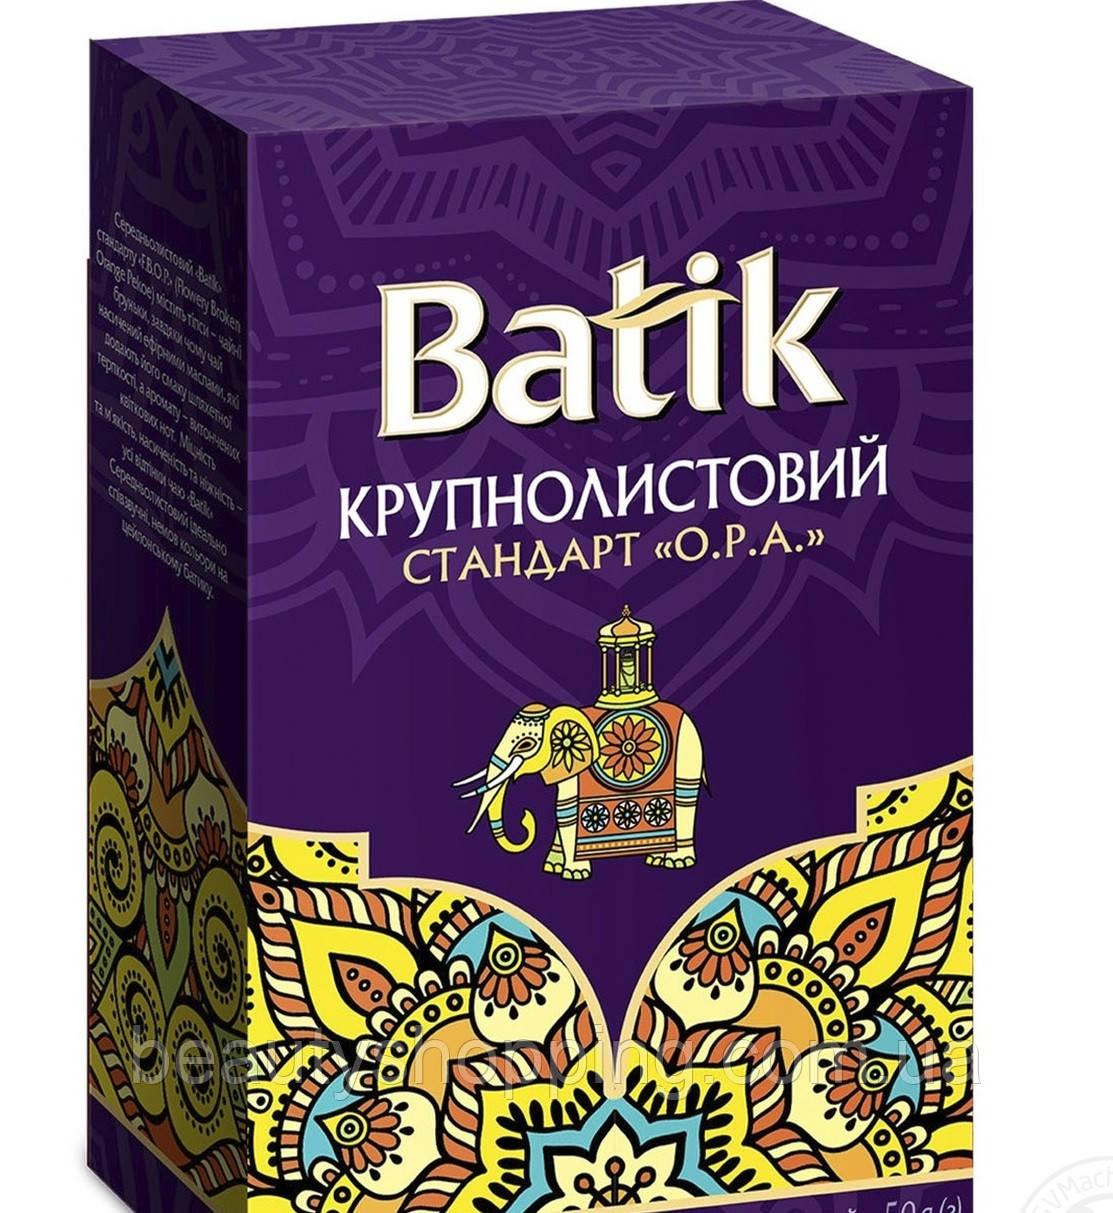 Batik Батік чай чорний байховий цейлонський крупнолистовий 100g